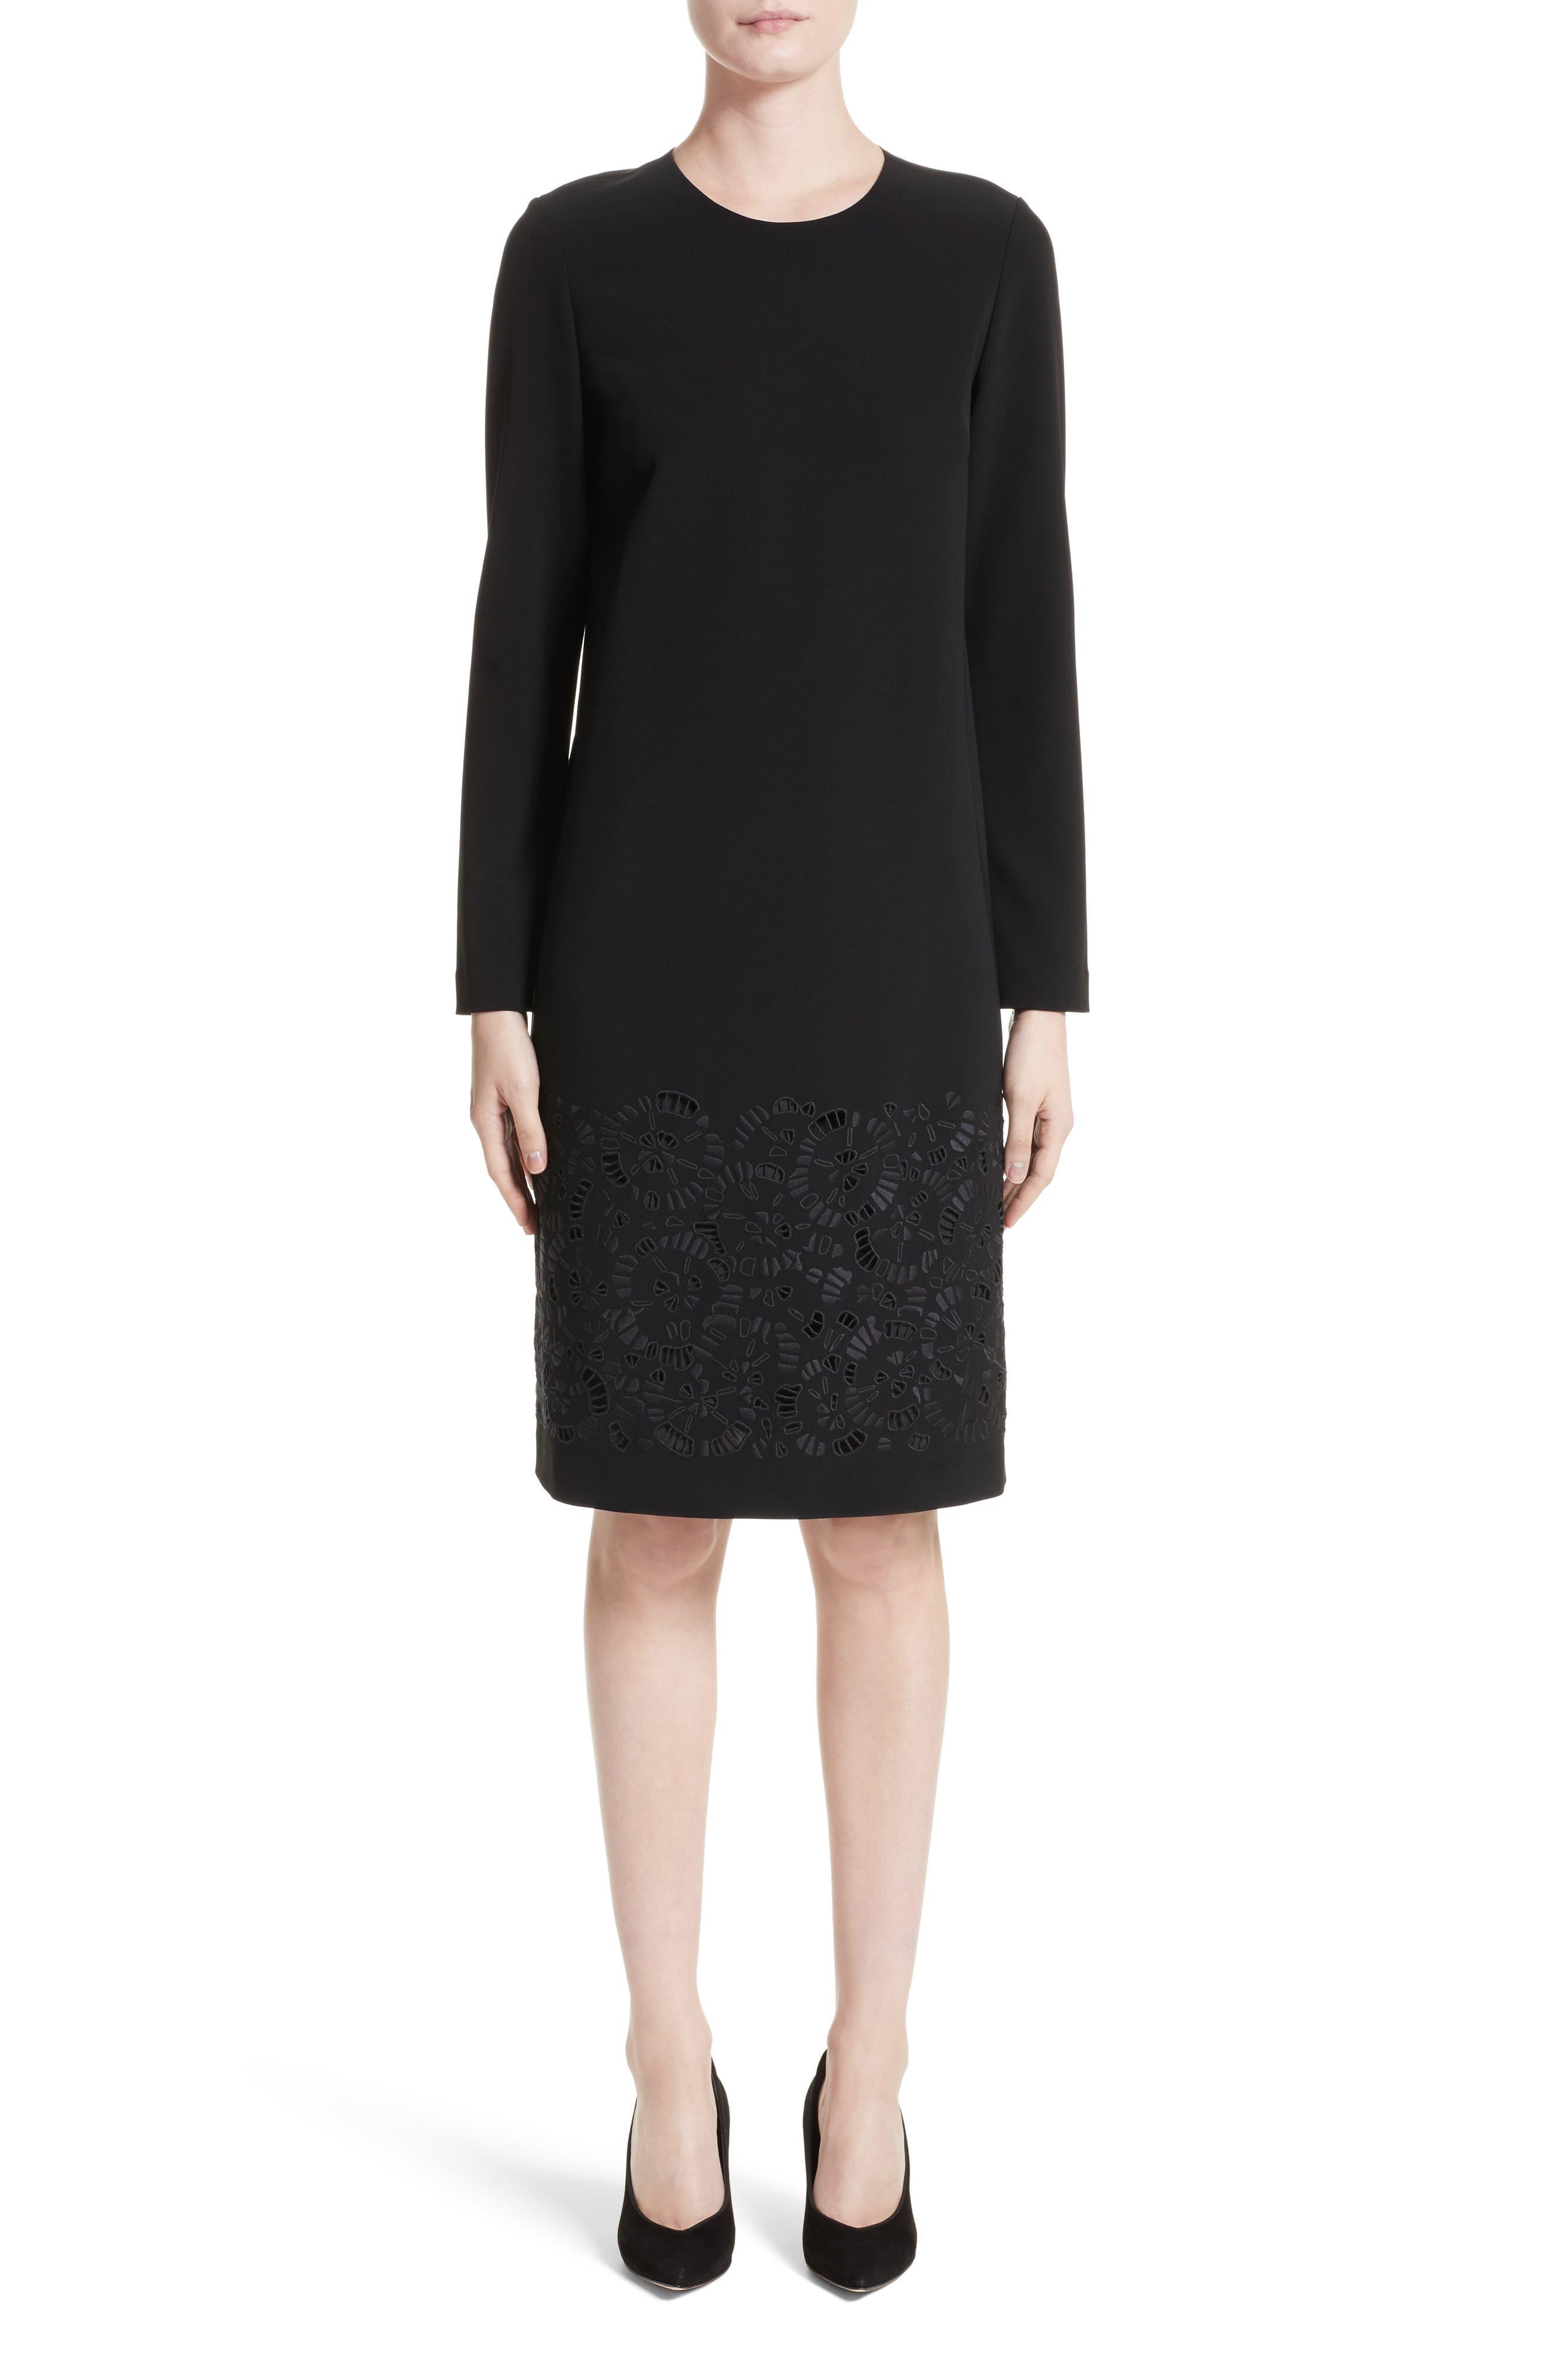 Corbin Embroidered Laser Cut Dress,                         Main,                         color, 001